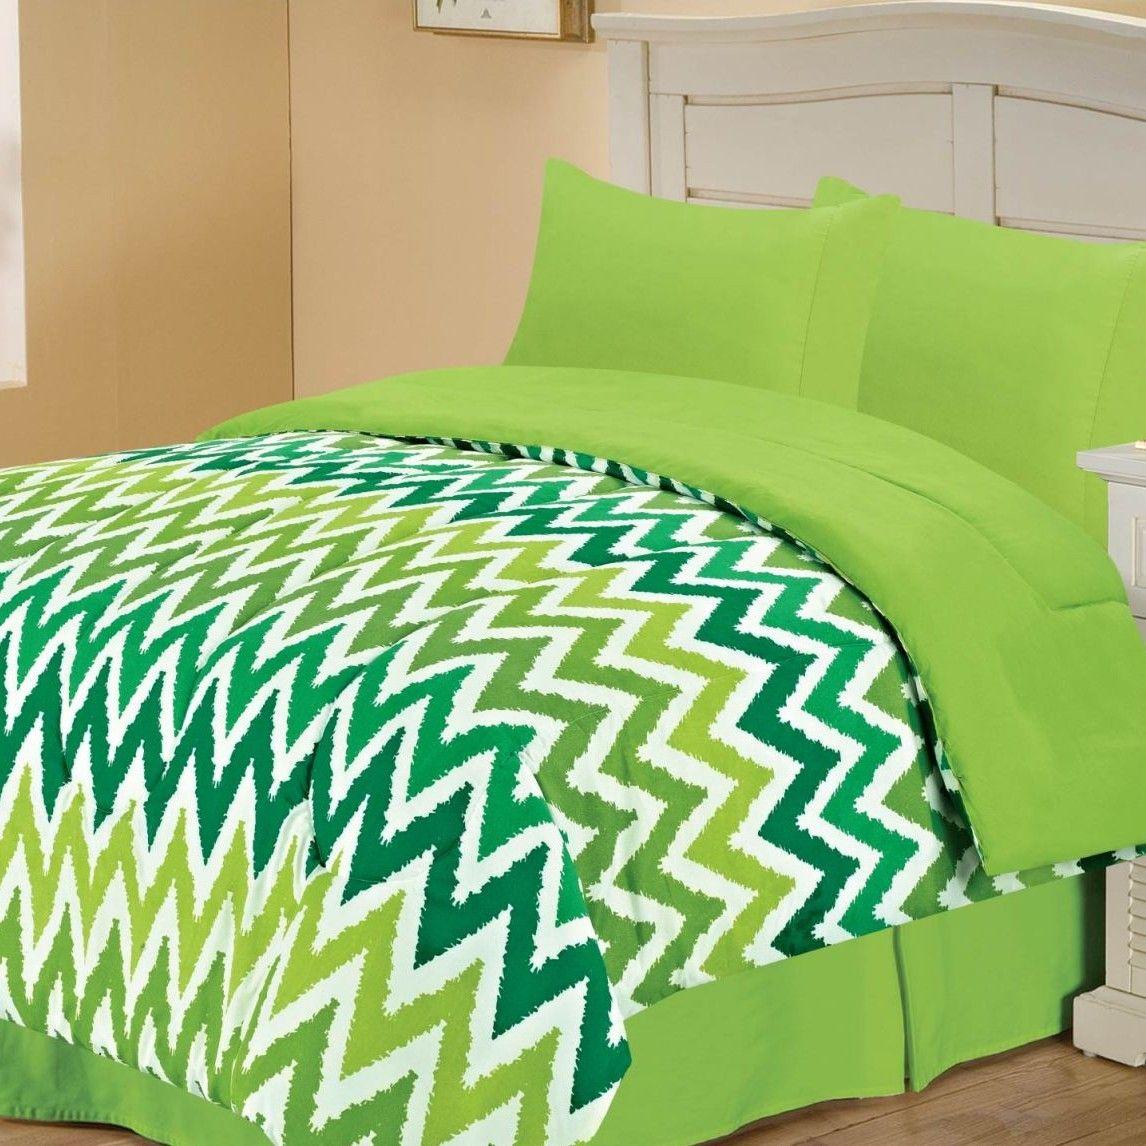 Blue and green bedding for teenage girls - Green Chevron Bedding Set